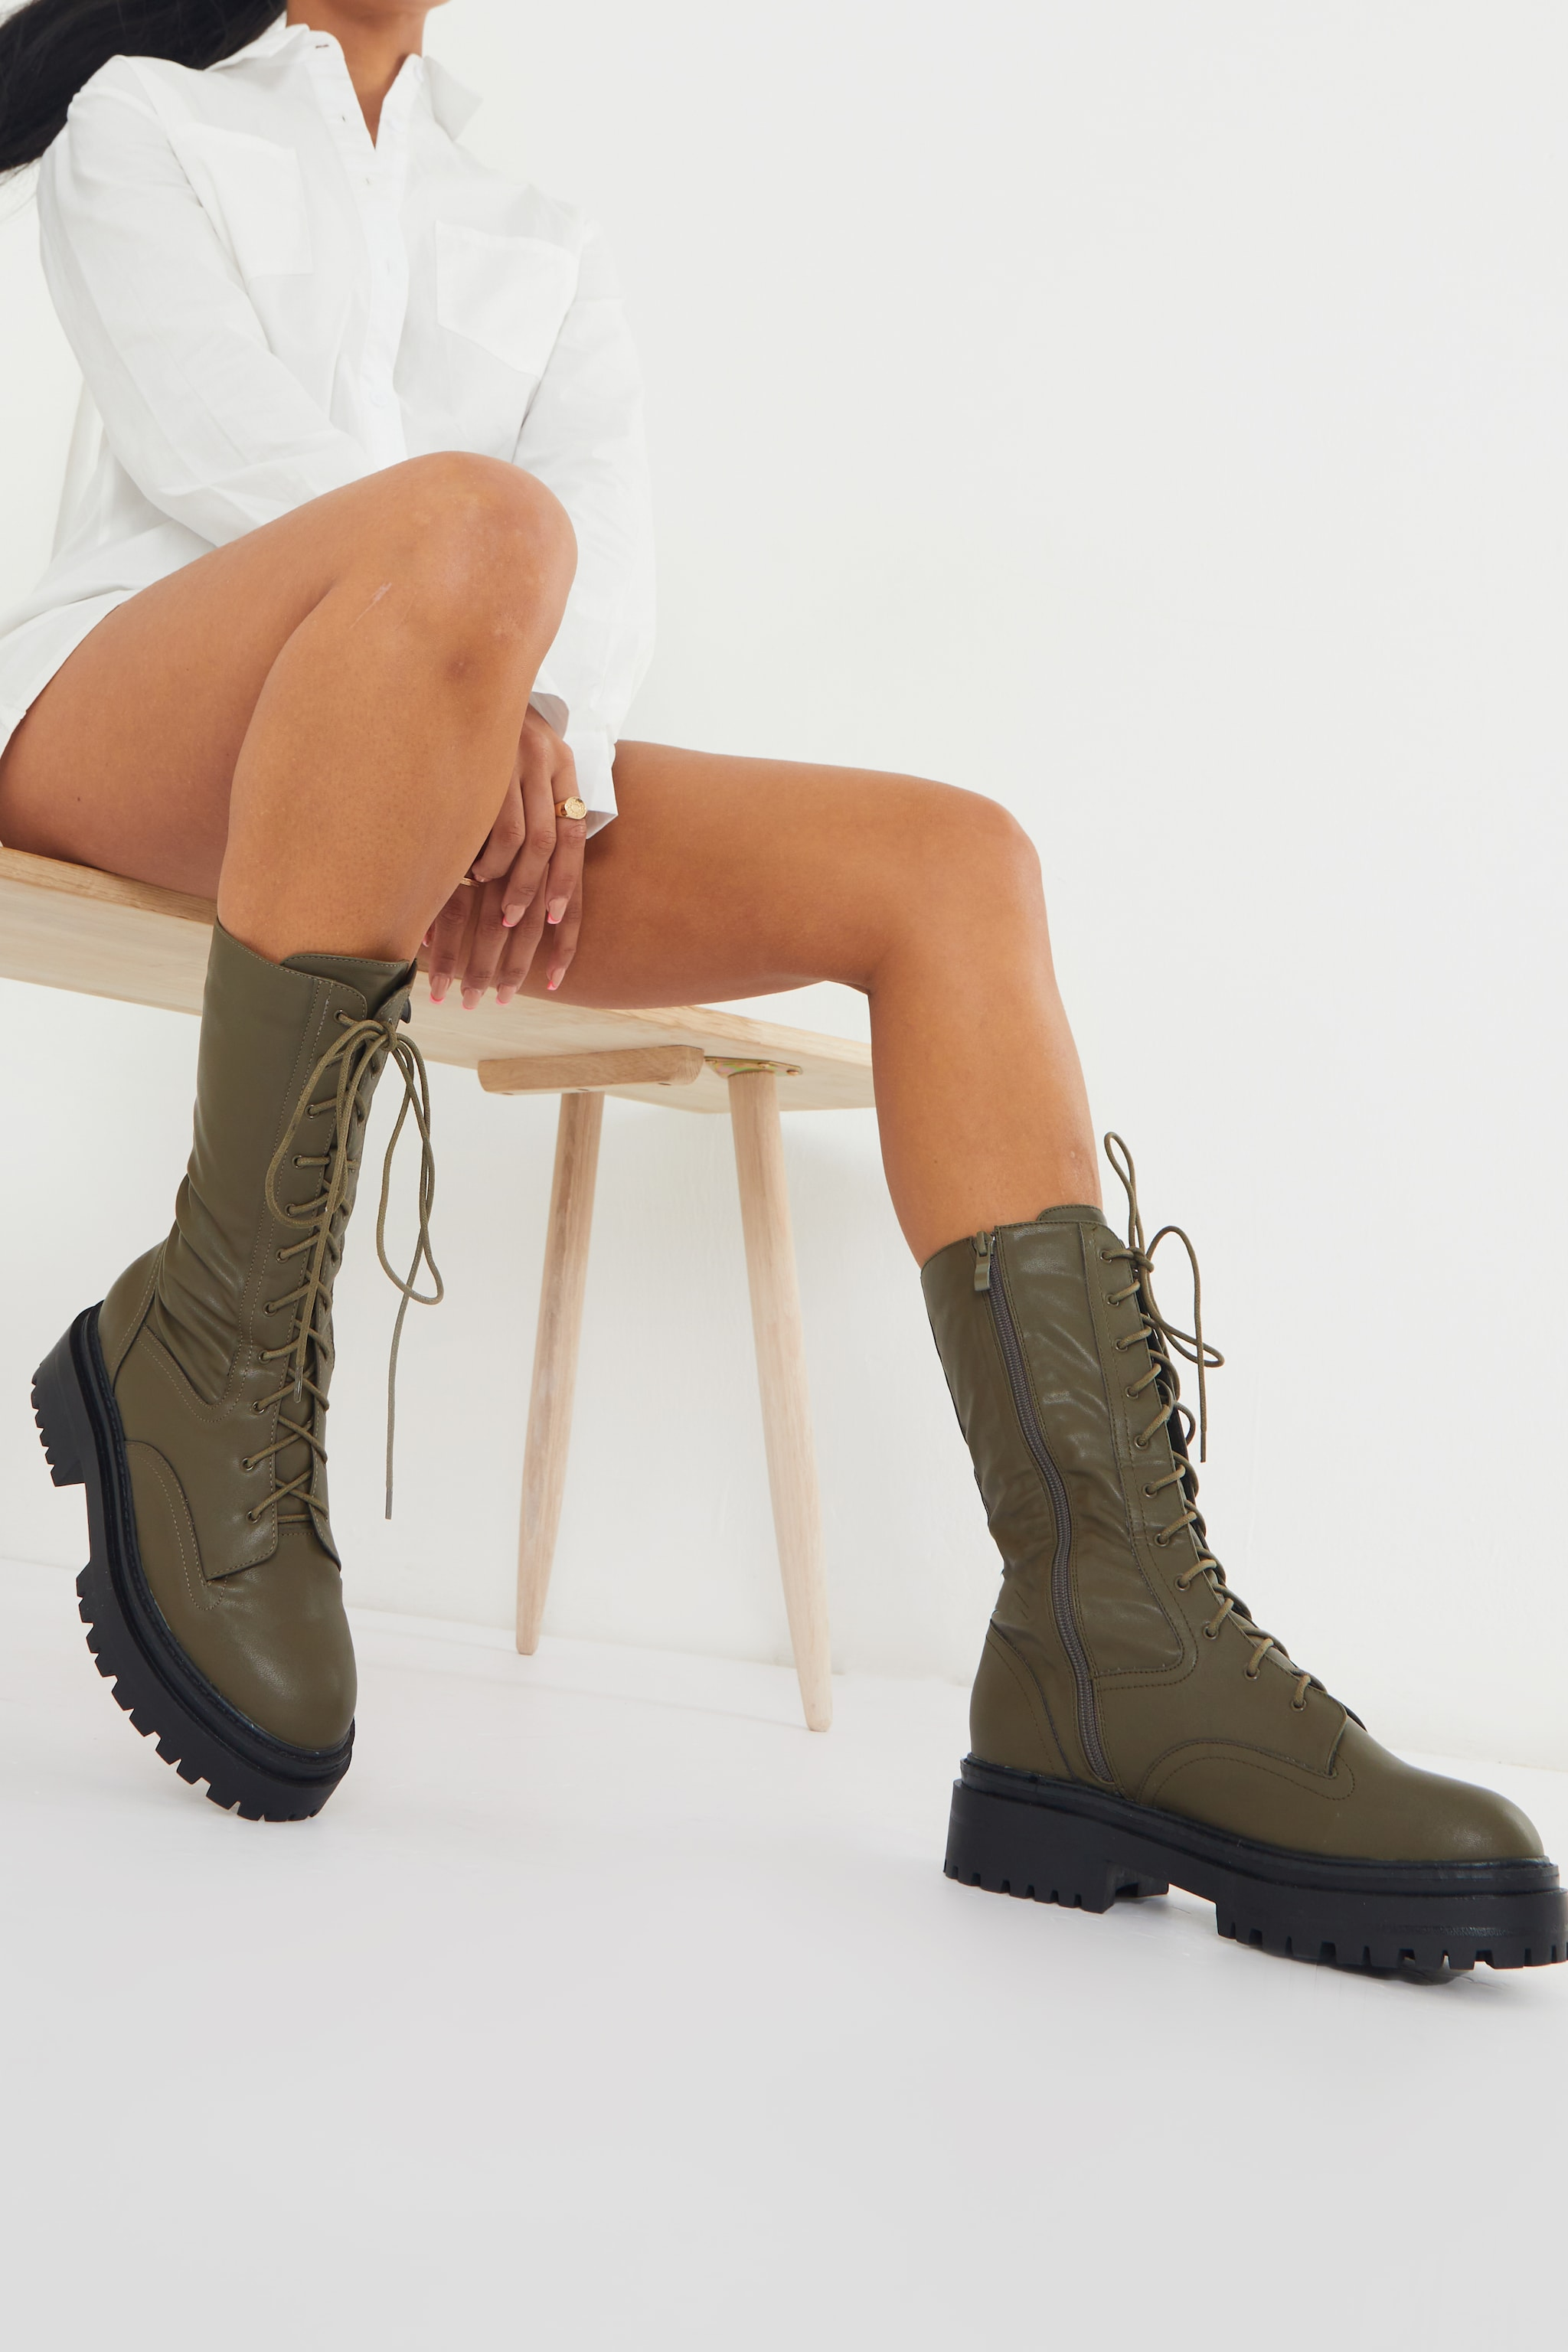 Khaki Calf High Lace Up Chunky Biker Boots 2